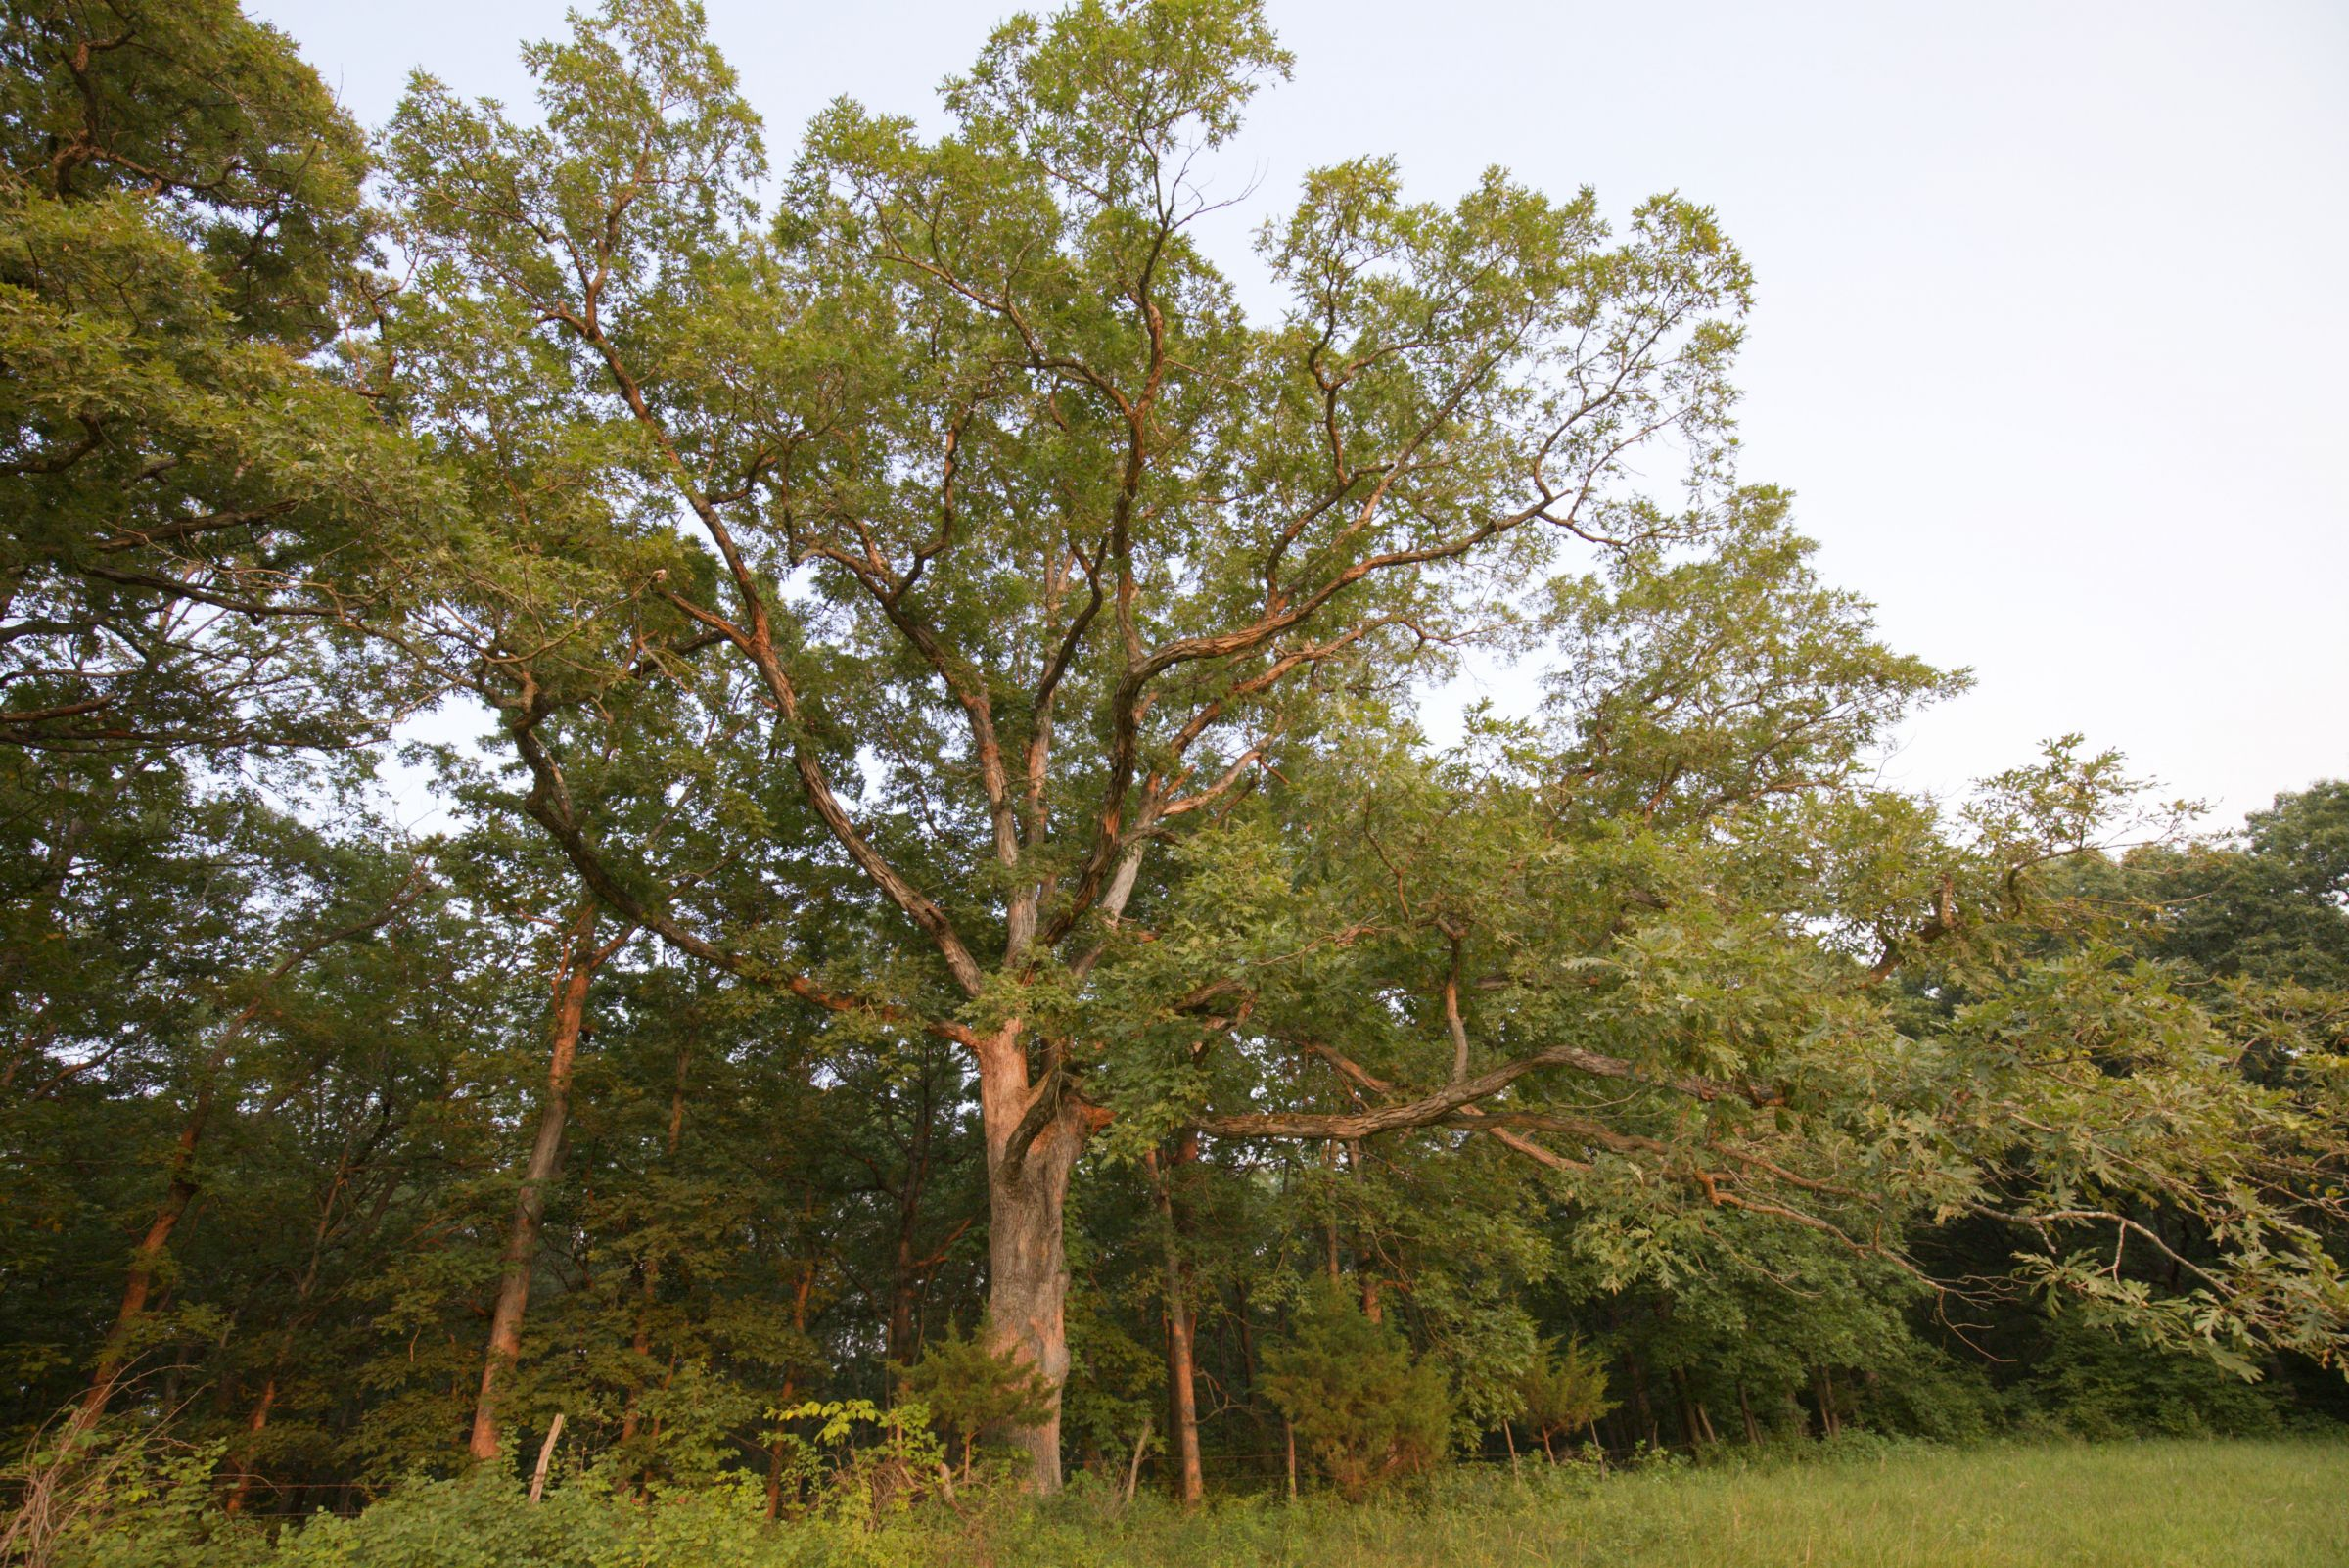 land-lee-county-iowa-340-acres-listing-number-15649-9-2021-07-21-185924.jpg